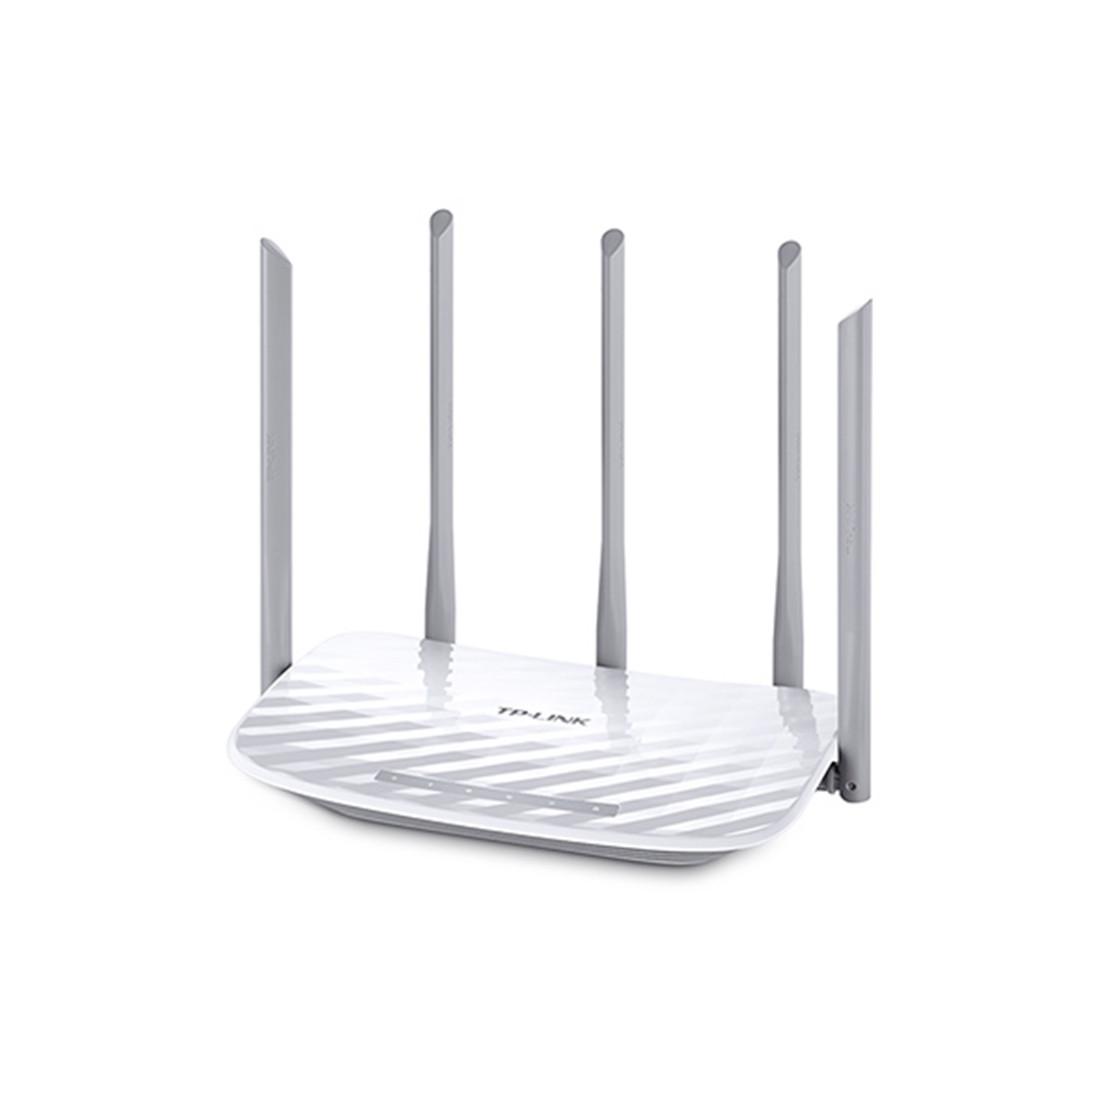 Маршрутизатор, TP-Link, Archer C60, 1350М, 1 WAN порт 10/100М + 4 LAN порта 10/100М